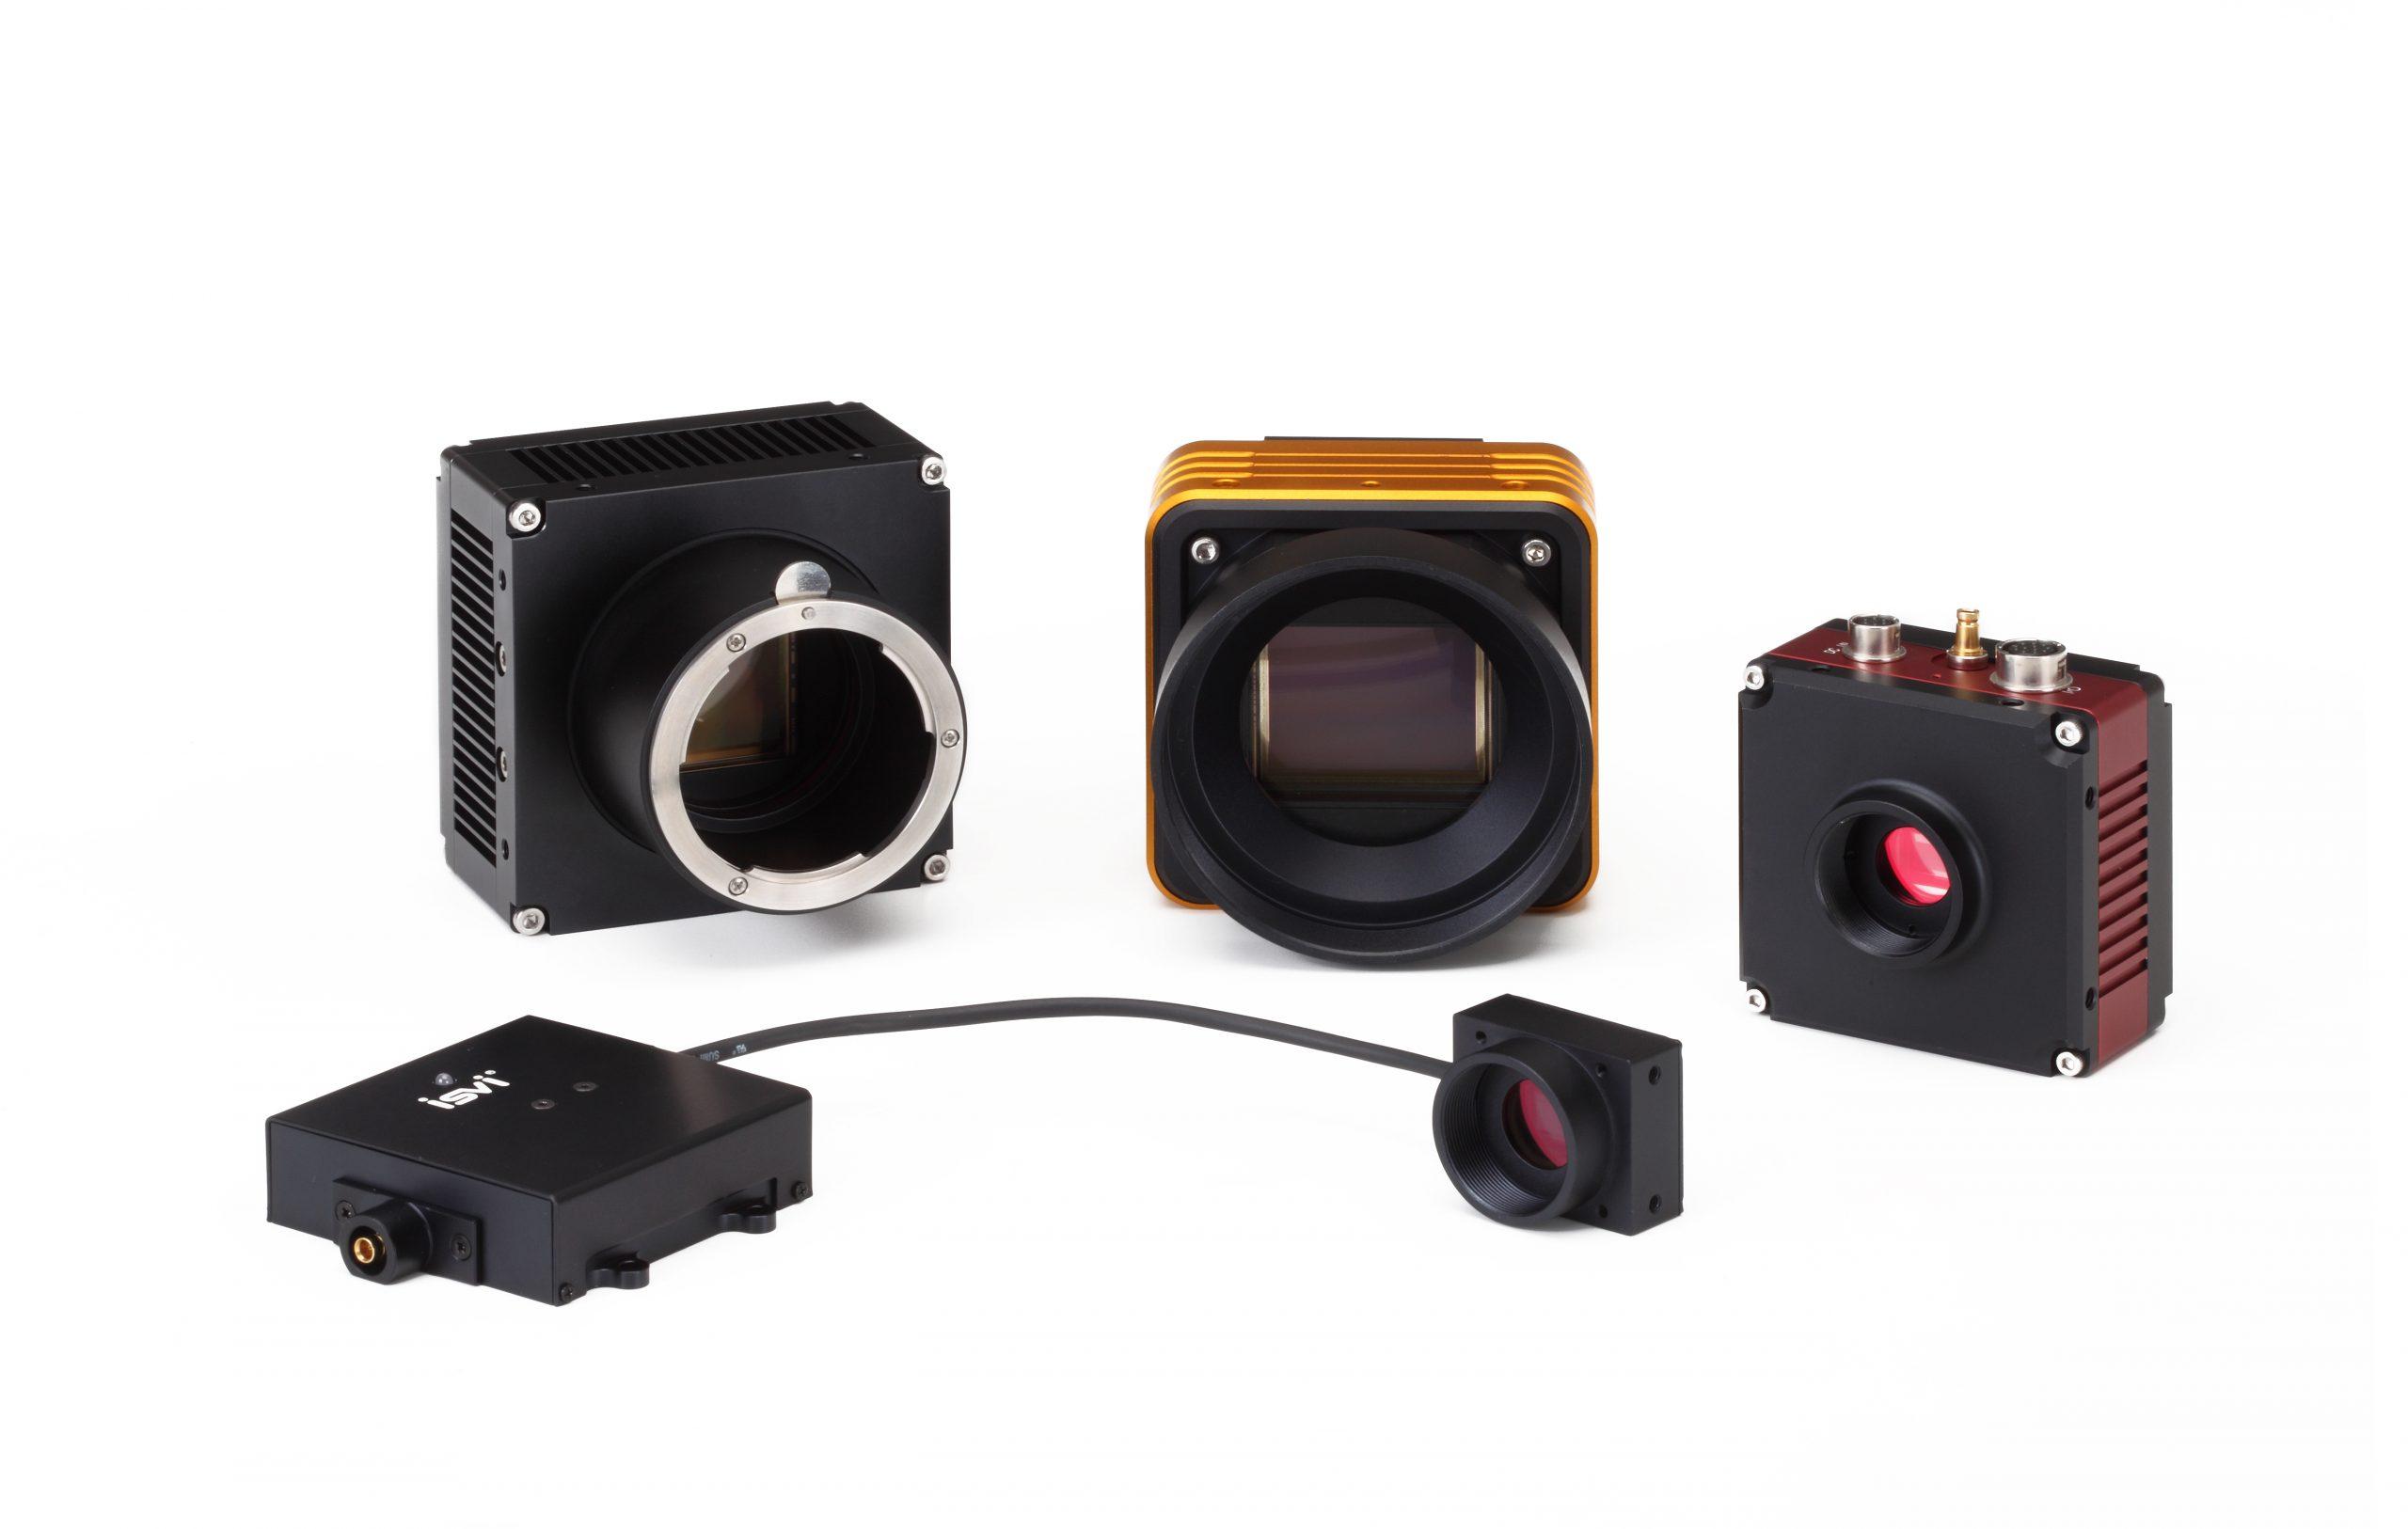 Six Reasons to Choose a CoaXPress Cameras | FRAMOS